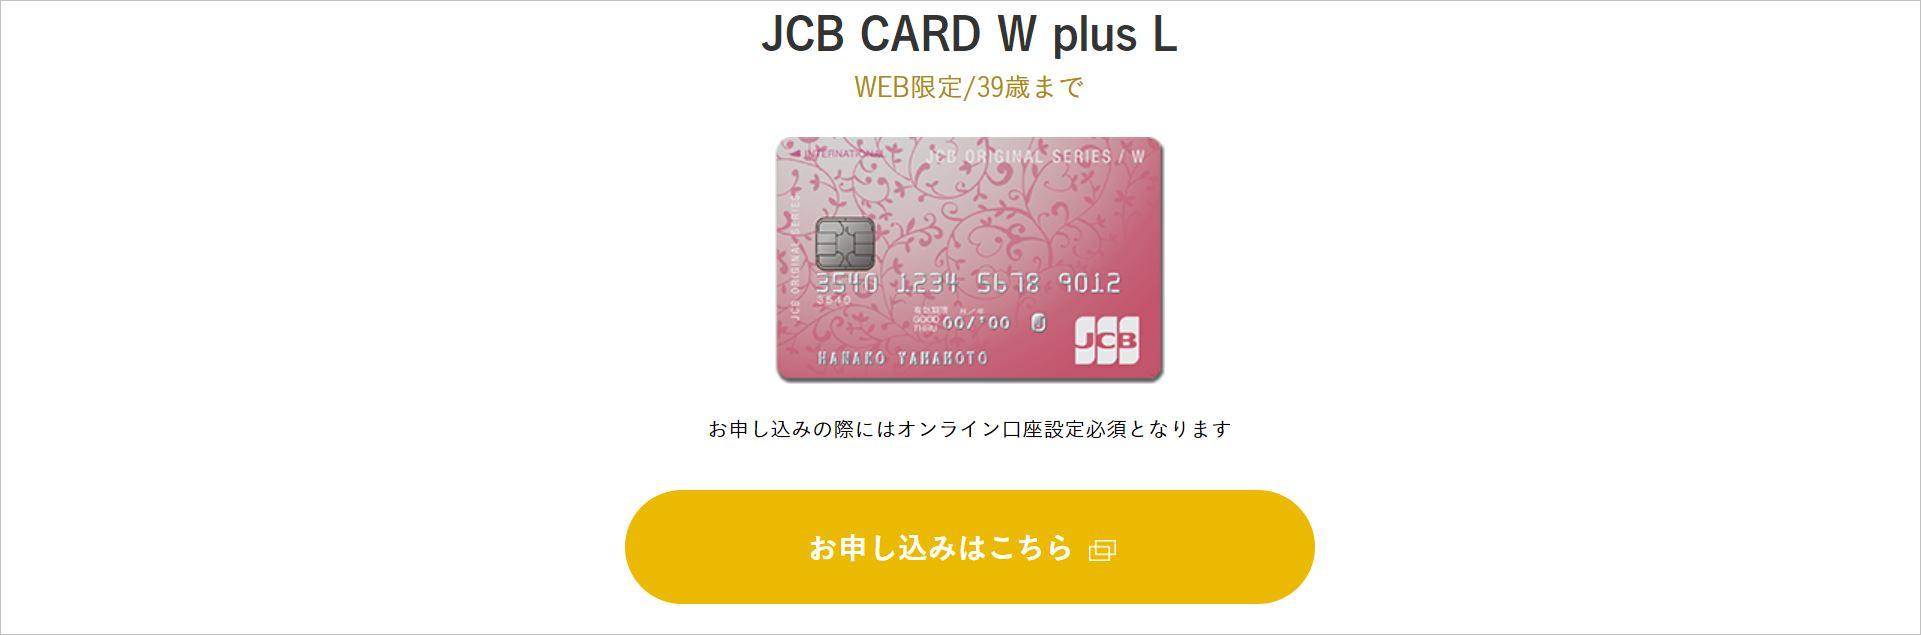 JCB CARD W plus Lのトップページ